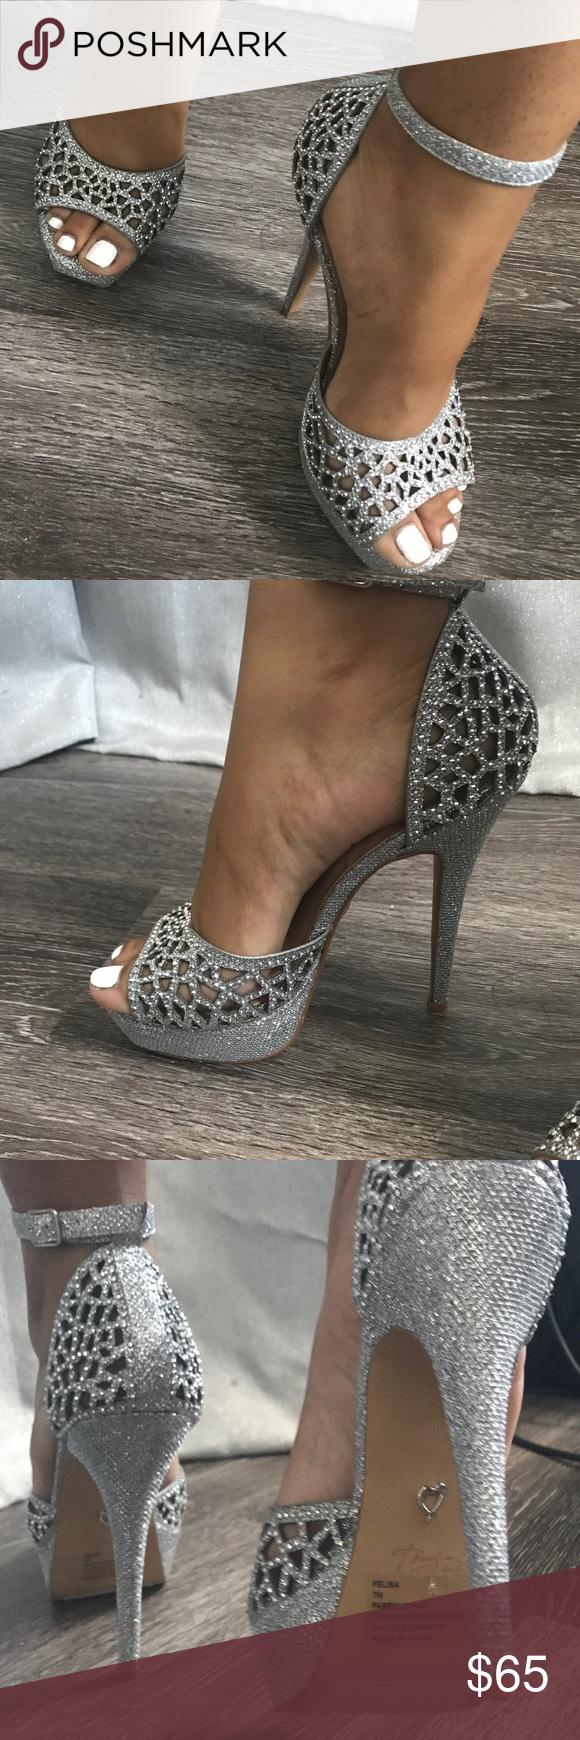 Sparkly heels, Silver sparkly heels